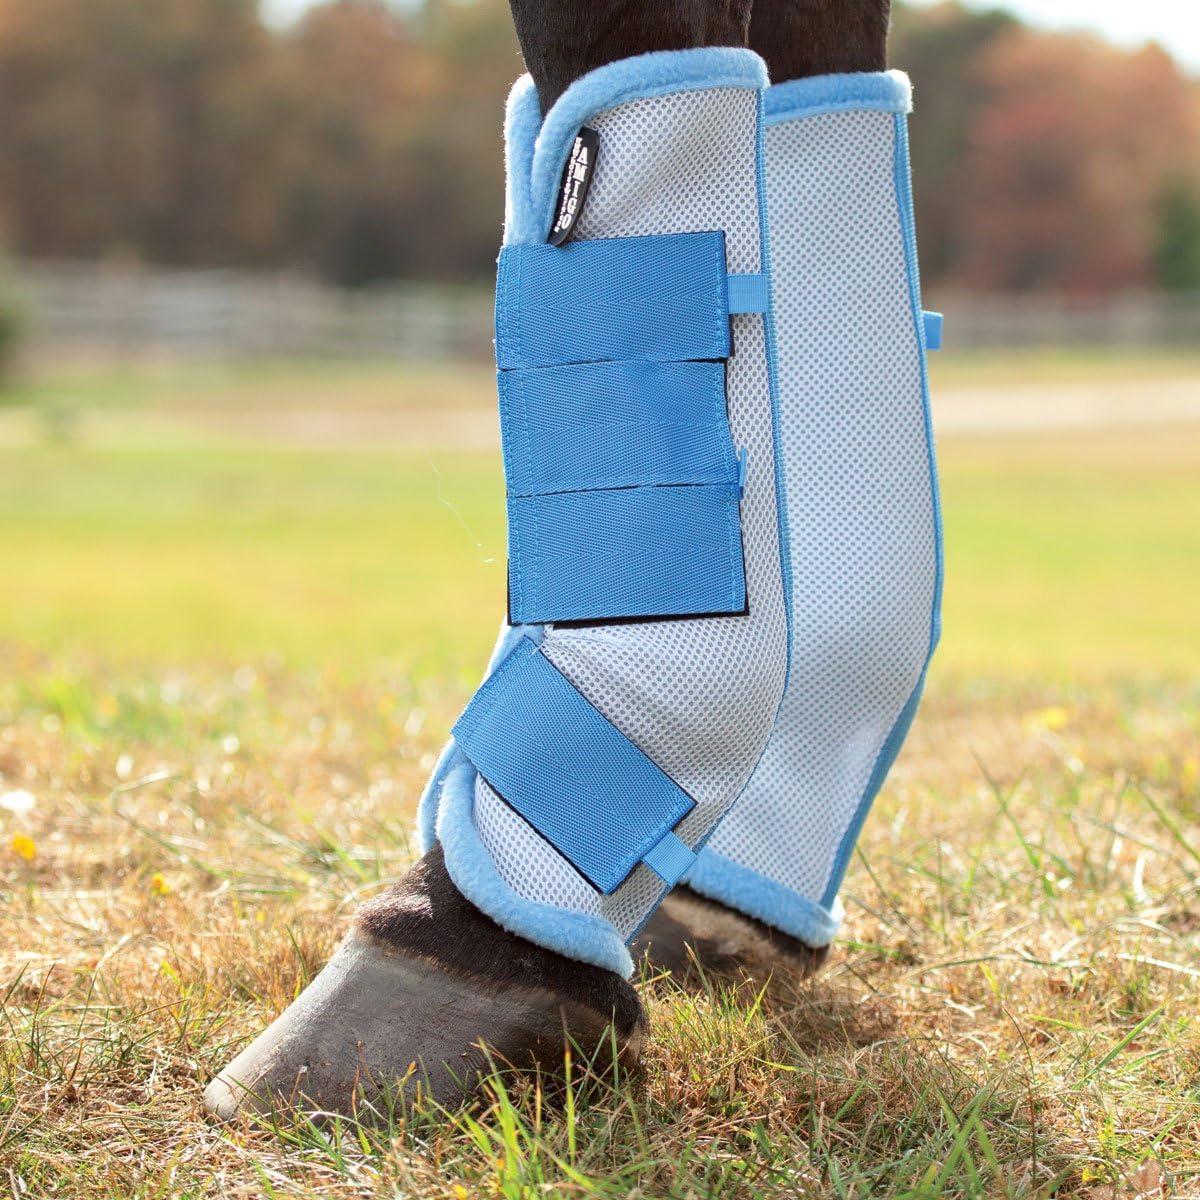 Horseware Ireland Amigo Fly Boots